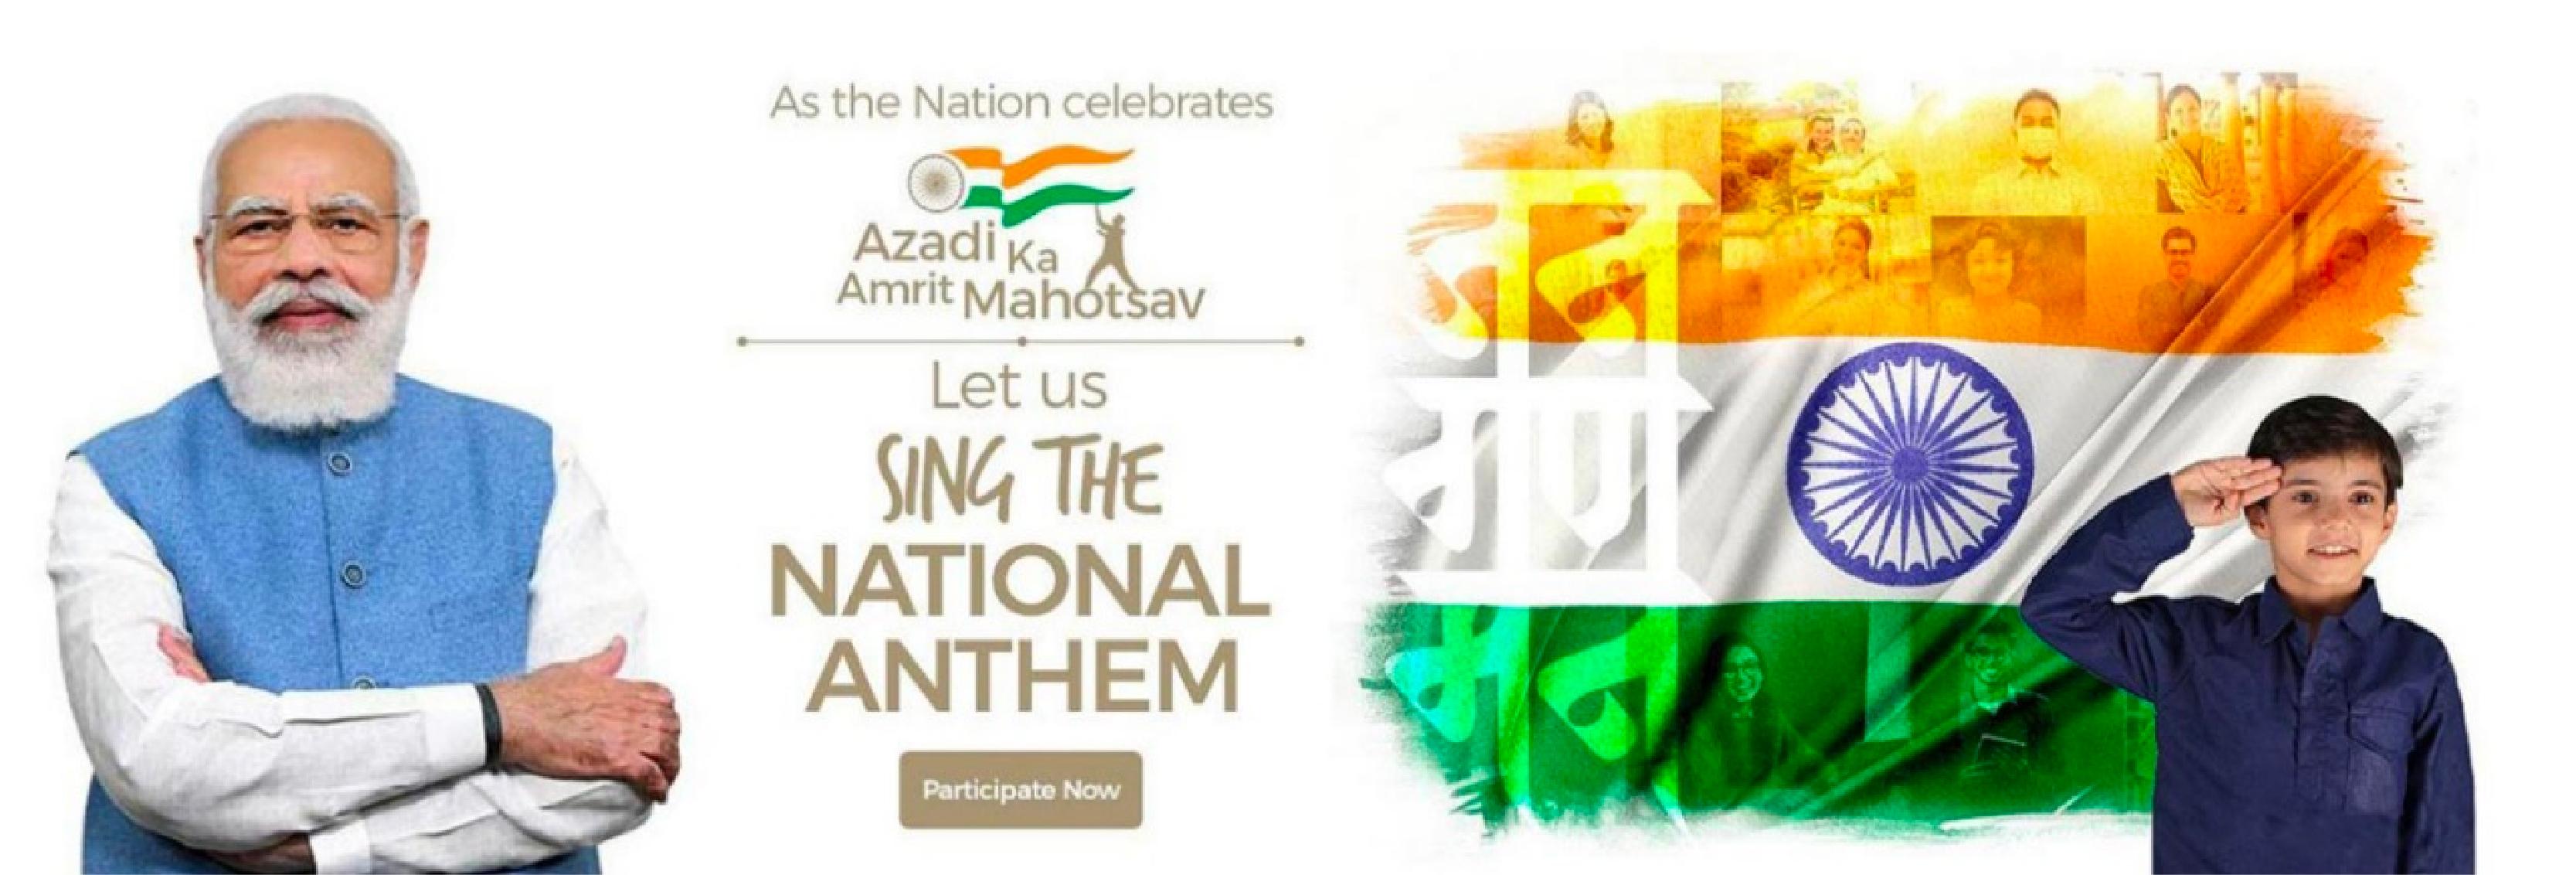 Aazadi ka Amrit Mahotsav Anthem